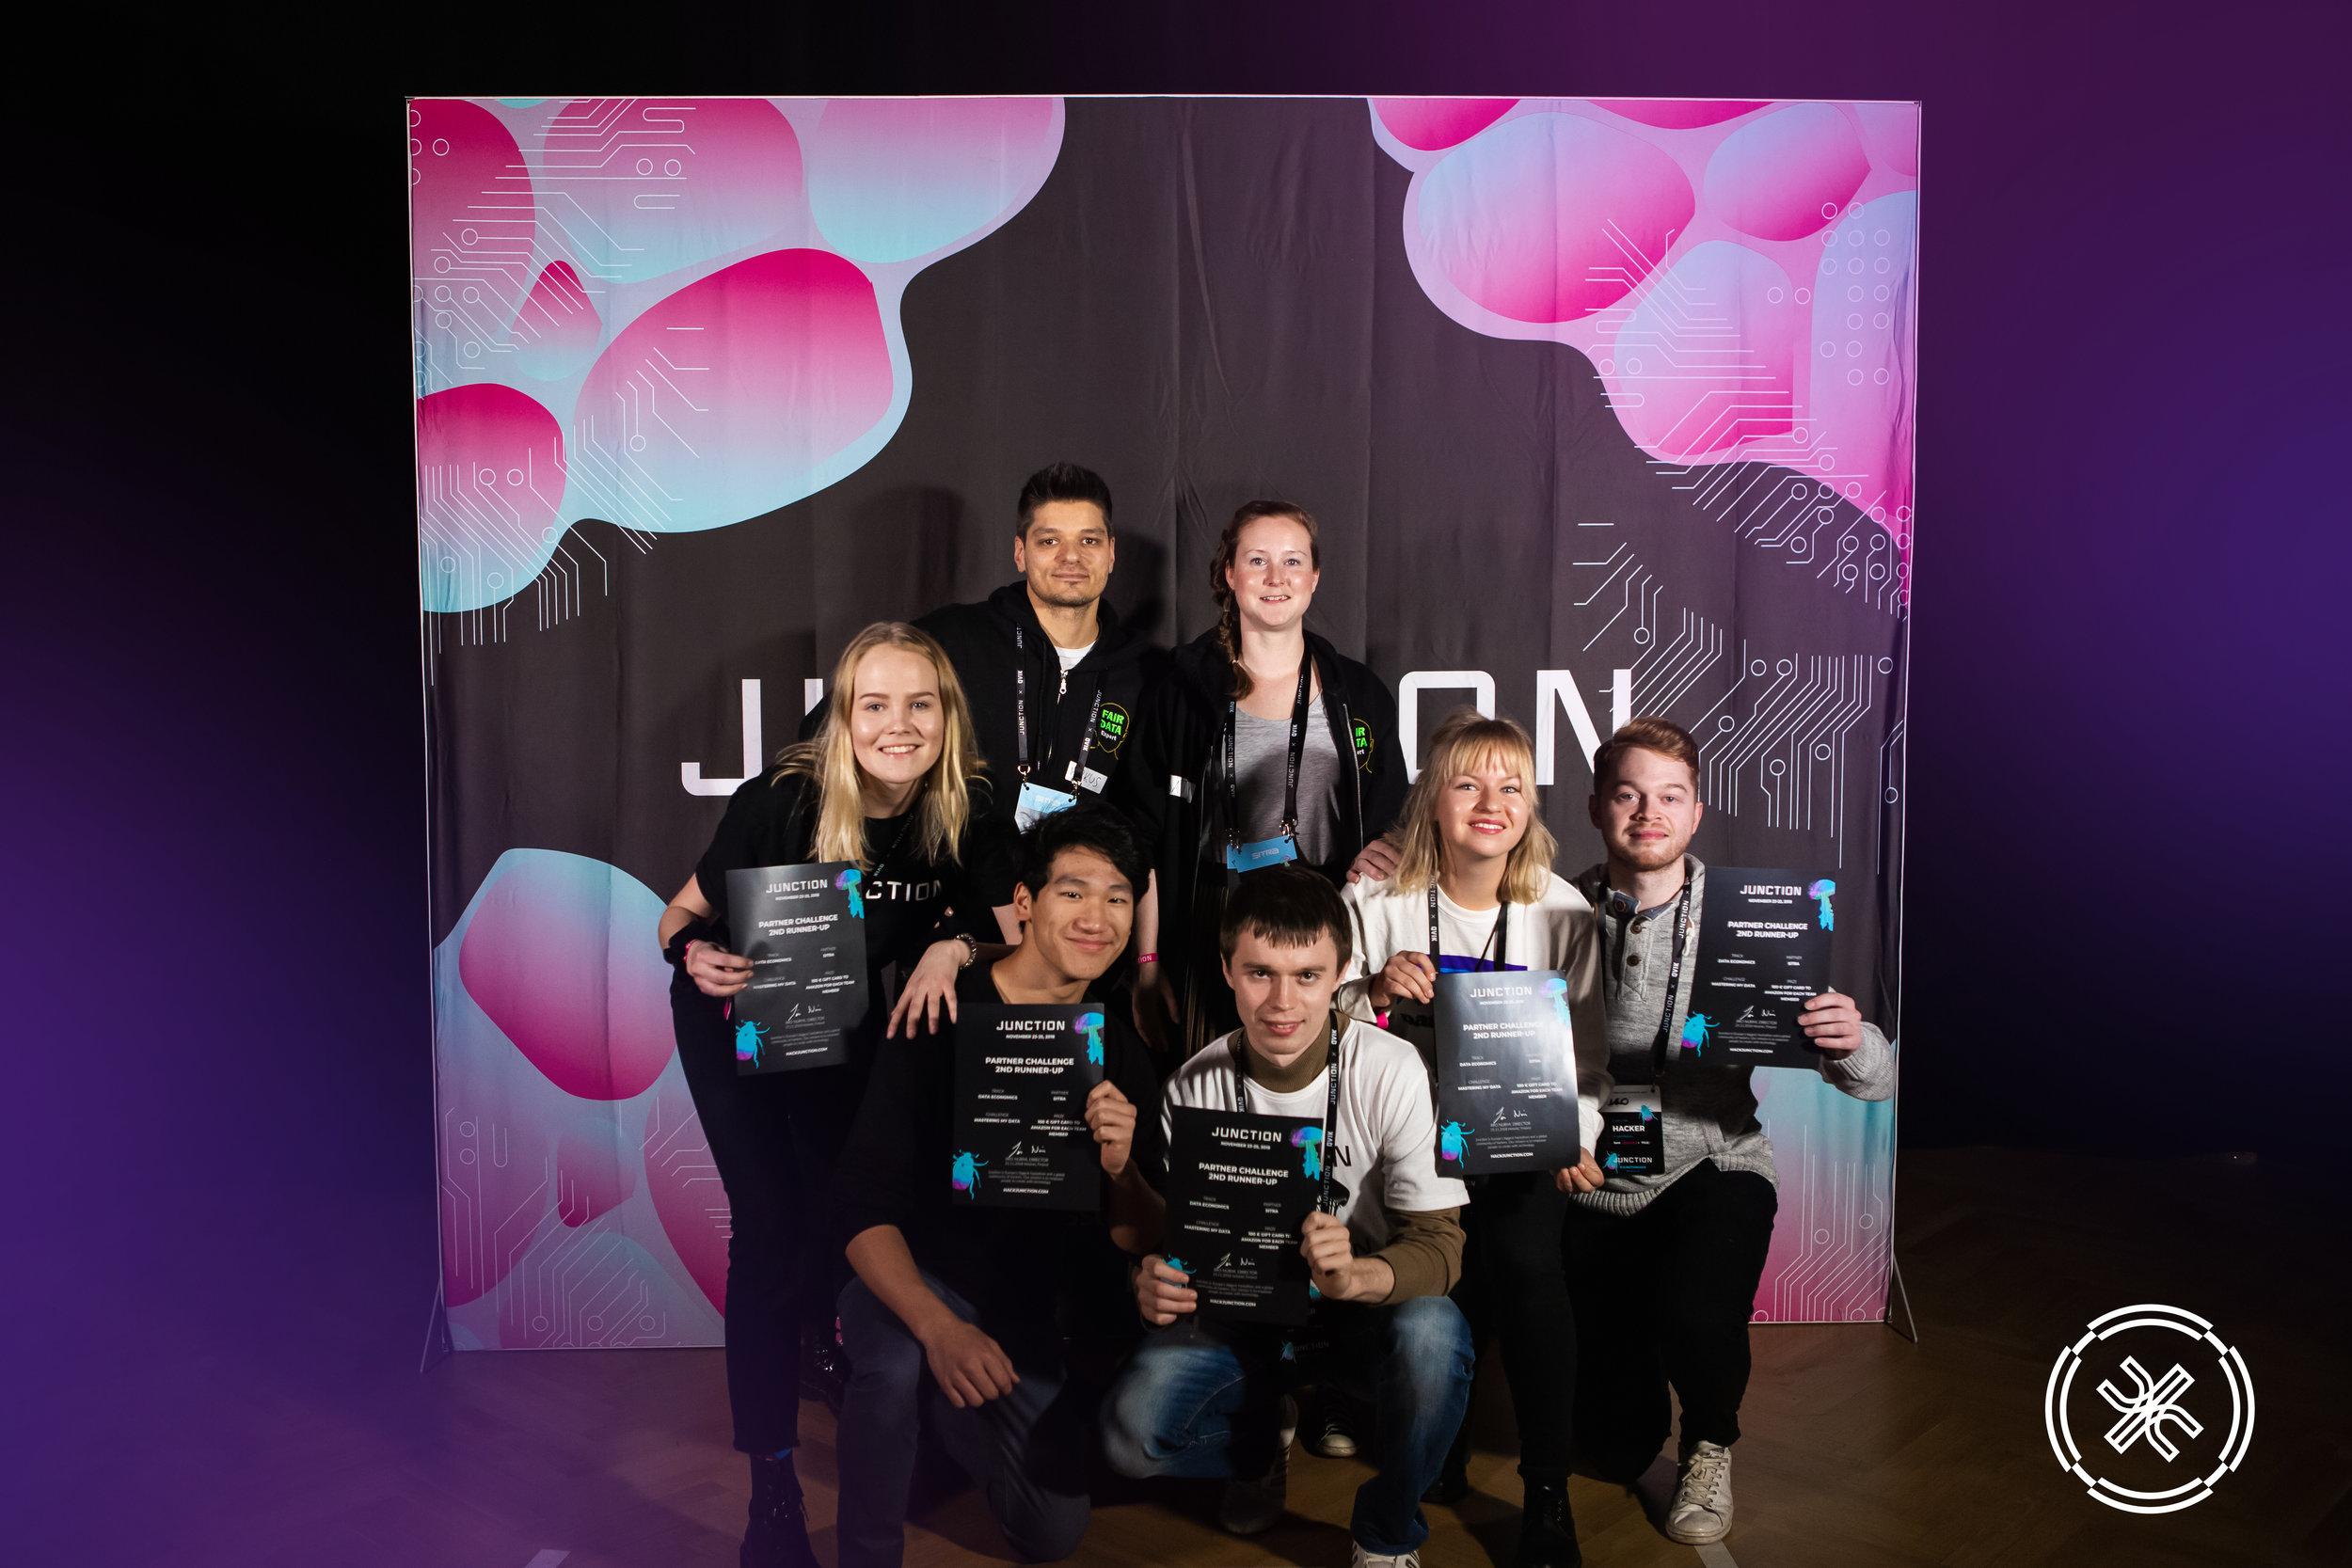 Team photo. Copyright Aino Röyskö / Junction